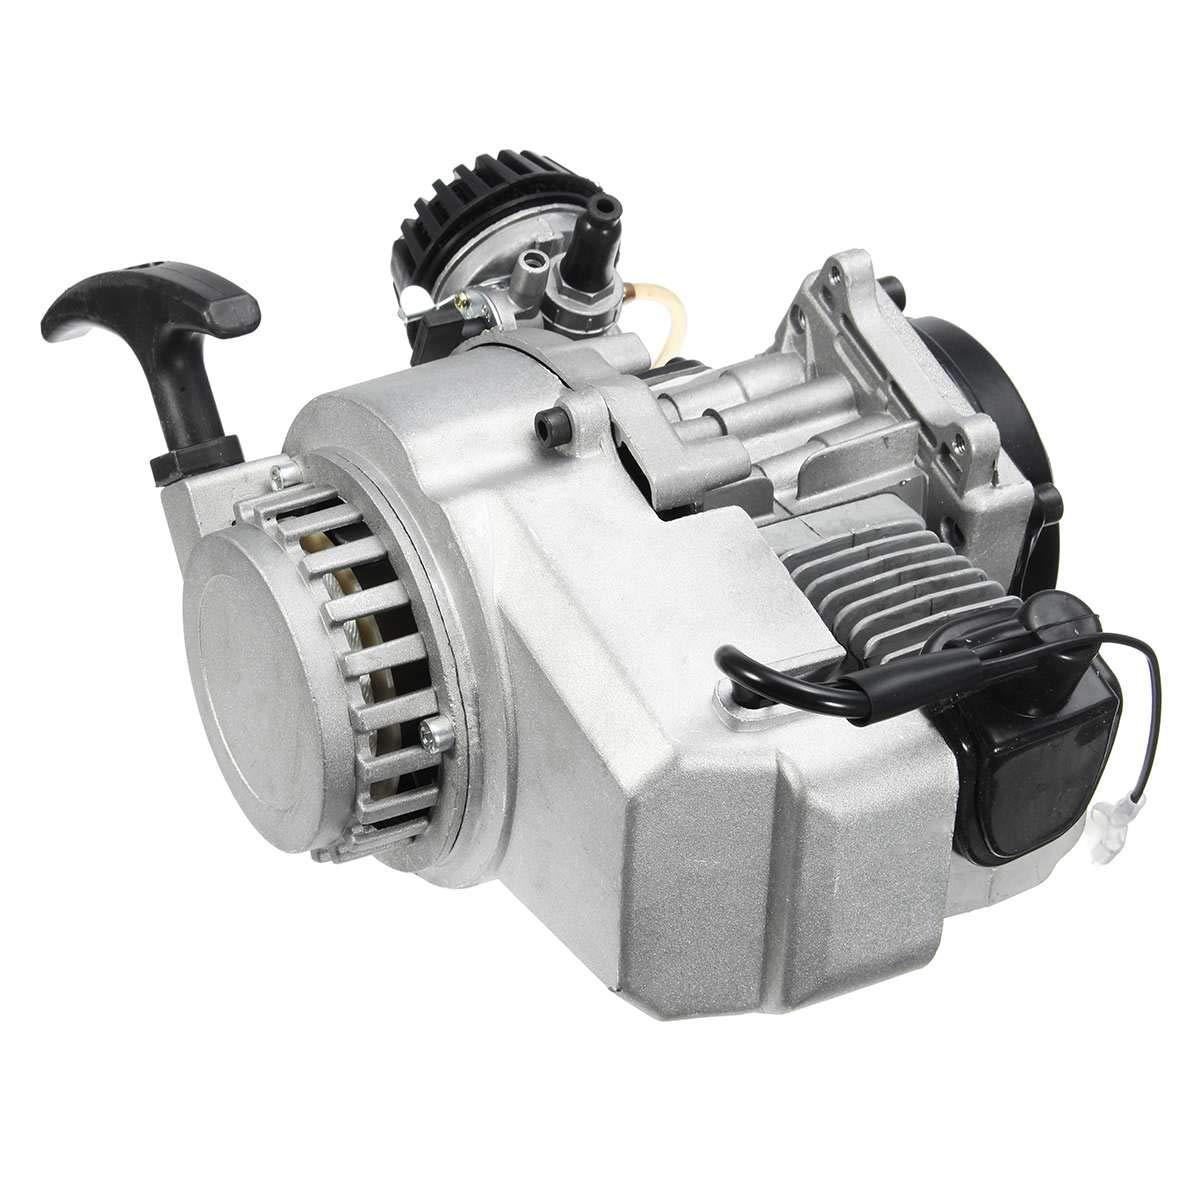 49cc 2-Stroke CDI Hand Pull Start Engine Motor For Pocket Bike Mini Dirt Bike ATV Scooter by Unkows (Image #2)